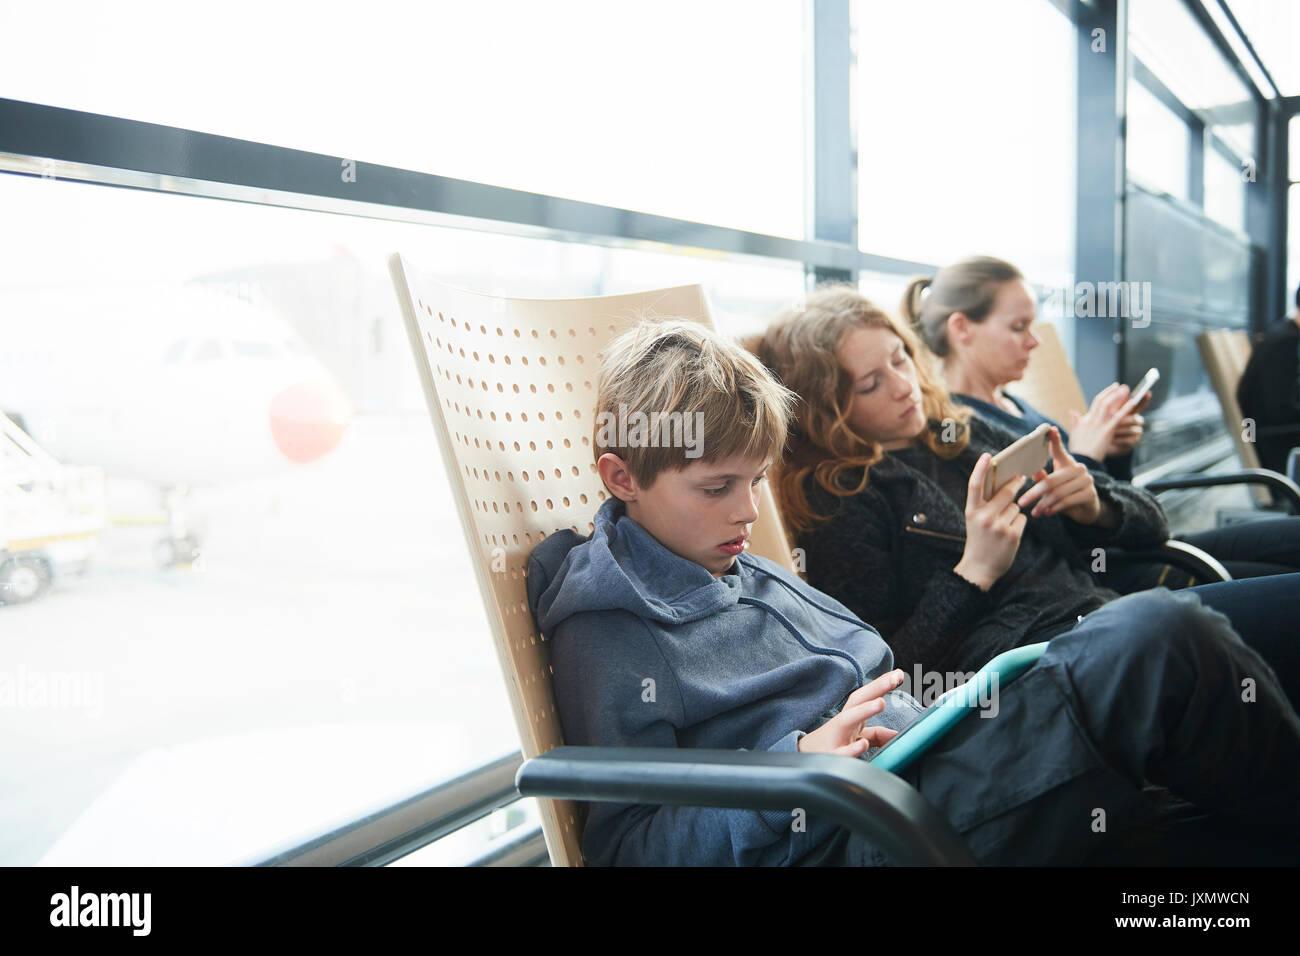 Familie am Flughafen auf dem Weg in den Urlaub, Kopenhagen, Dänemark Stockbild